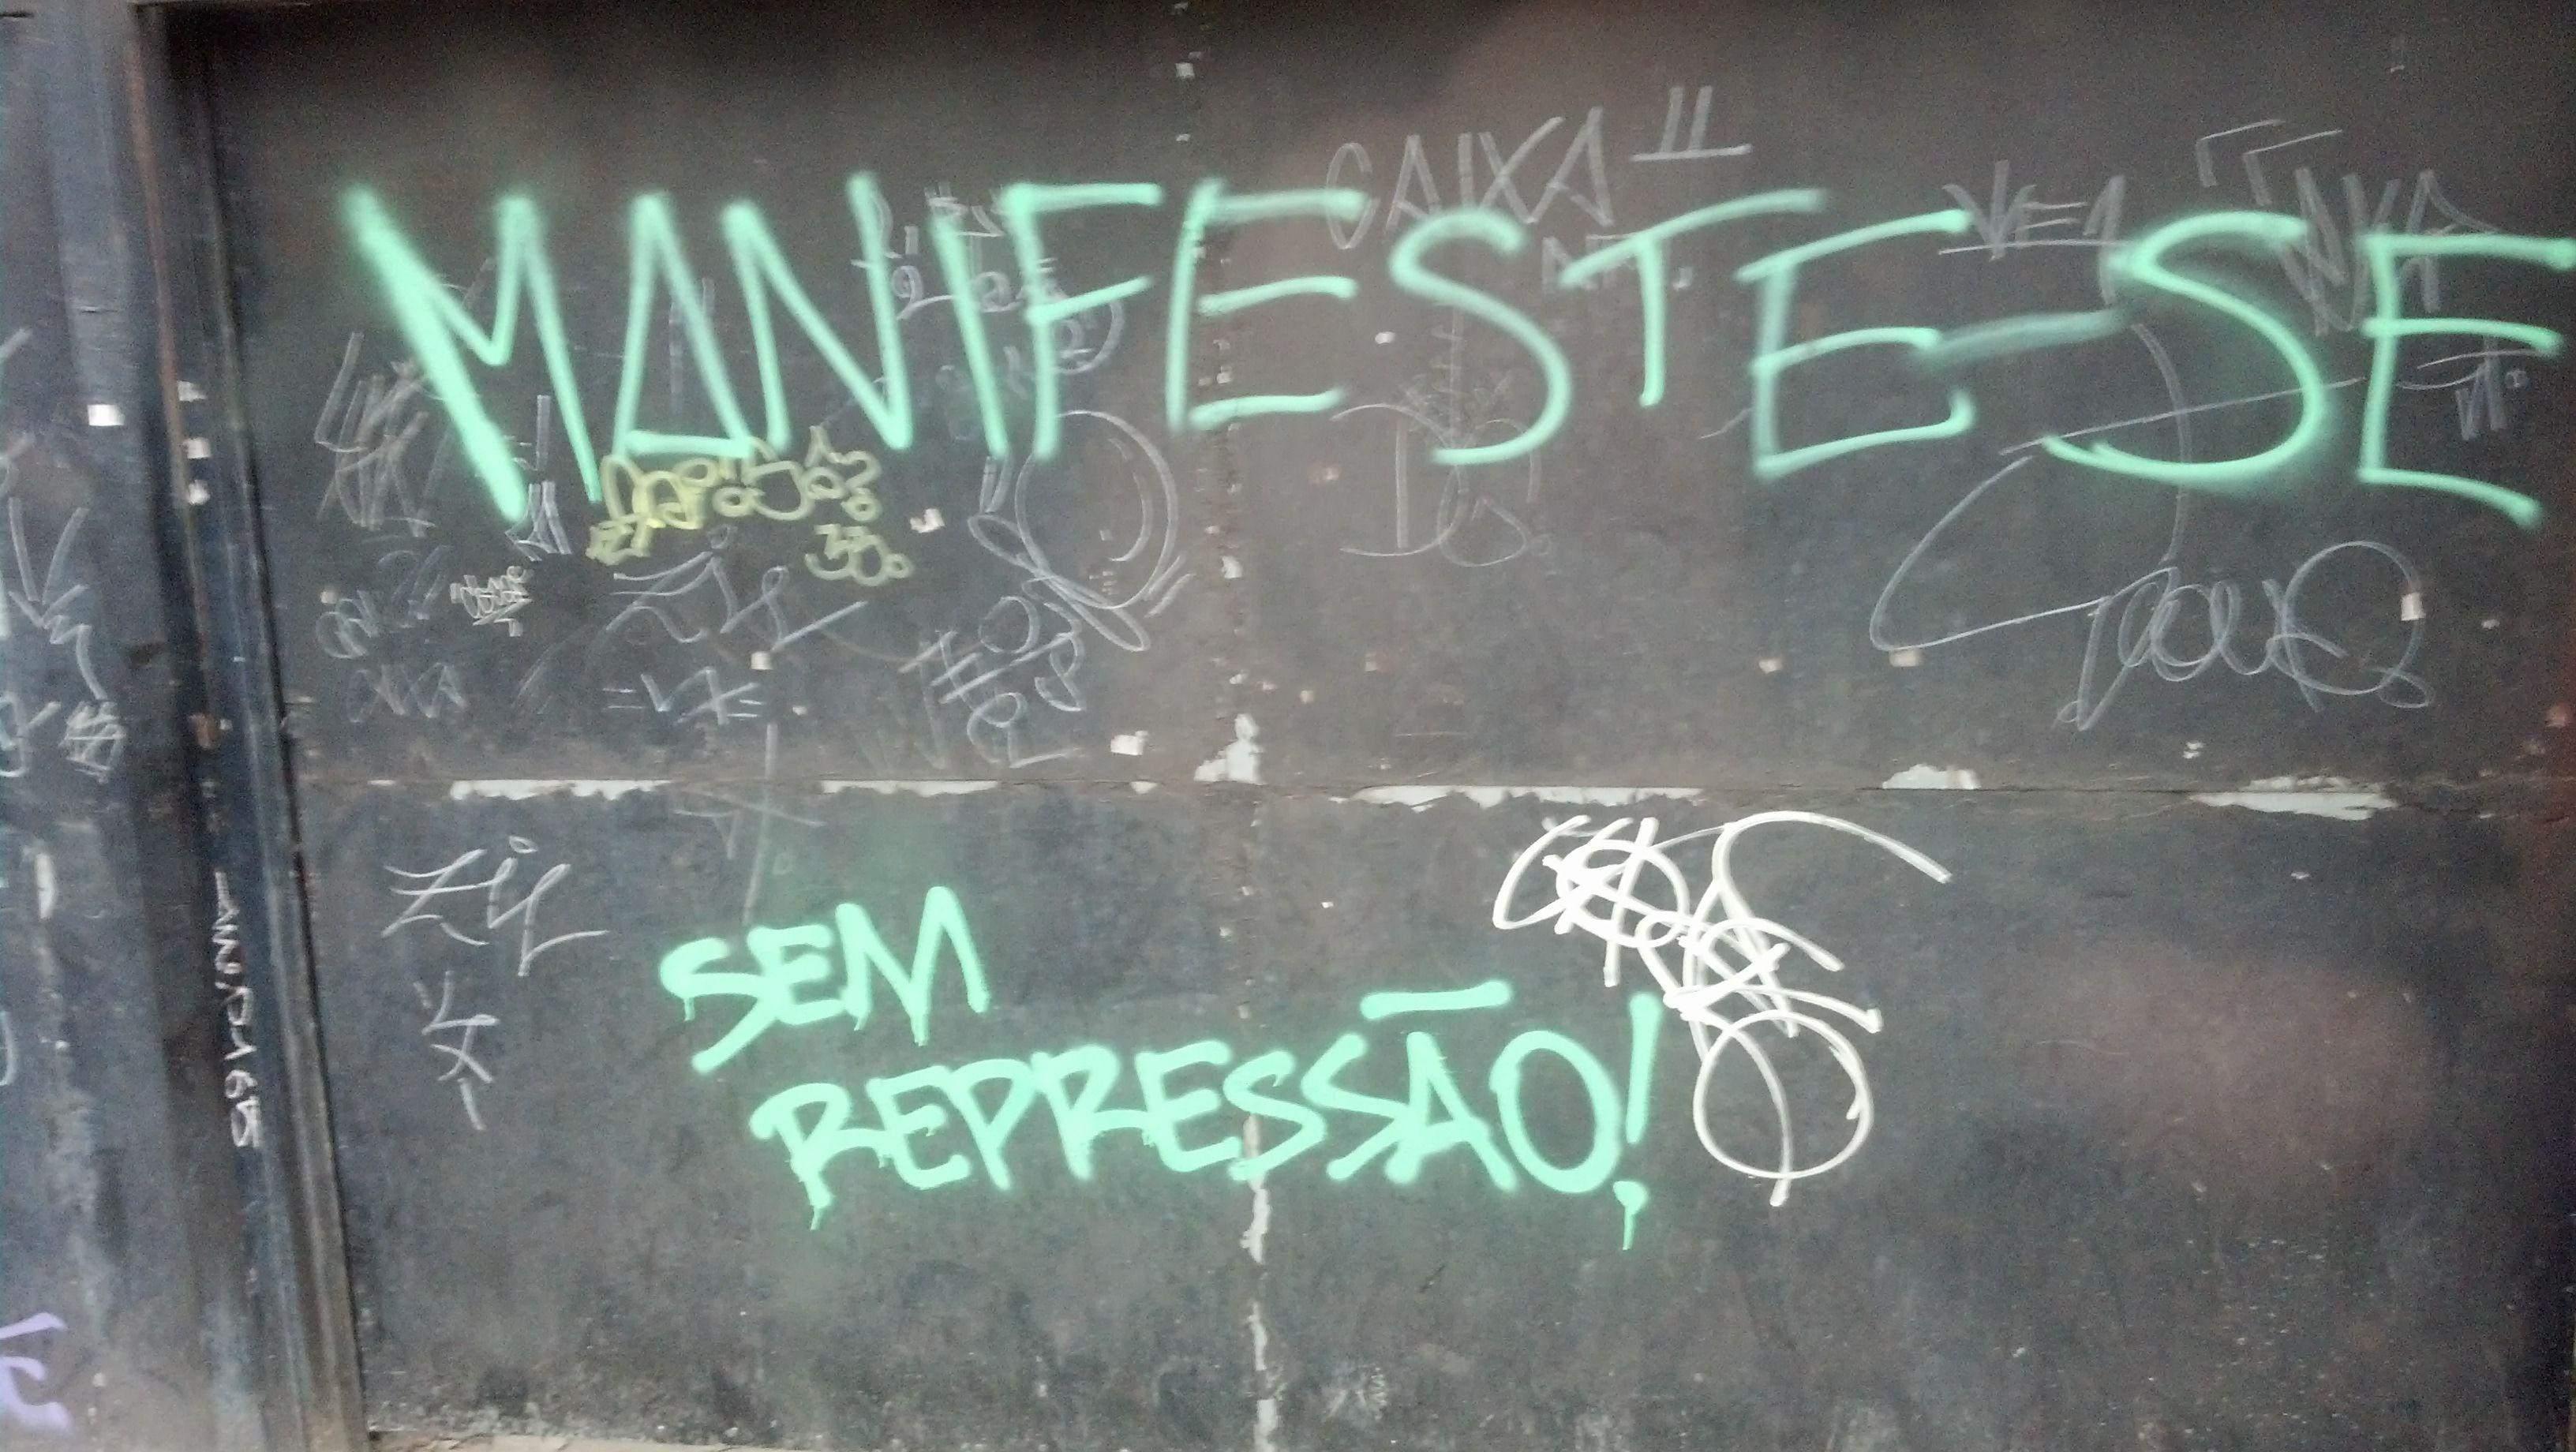 Leolivera - São Paulo, Brazil